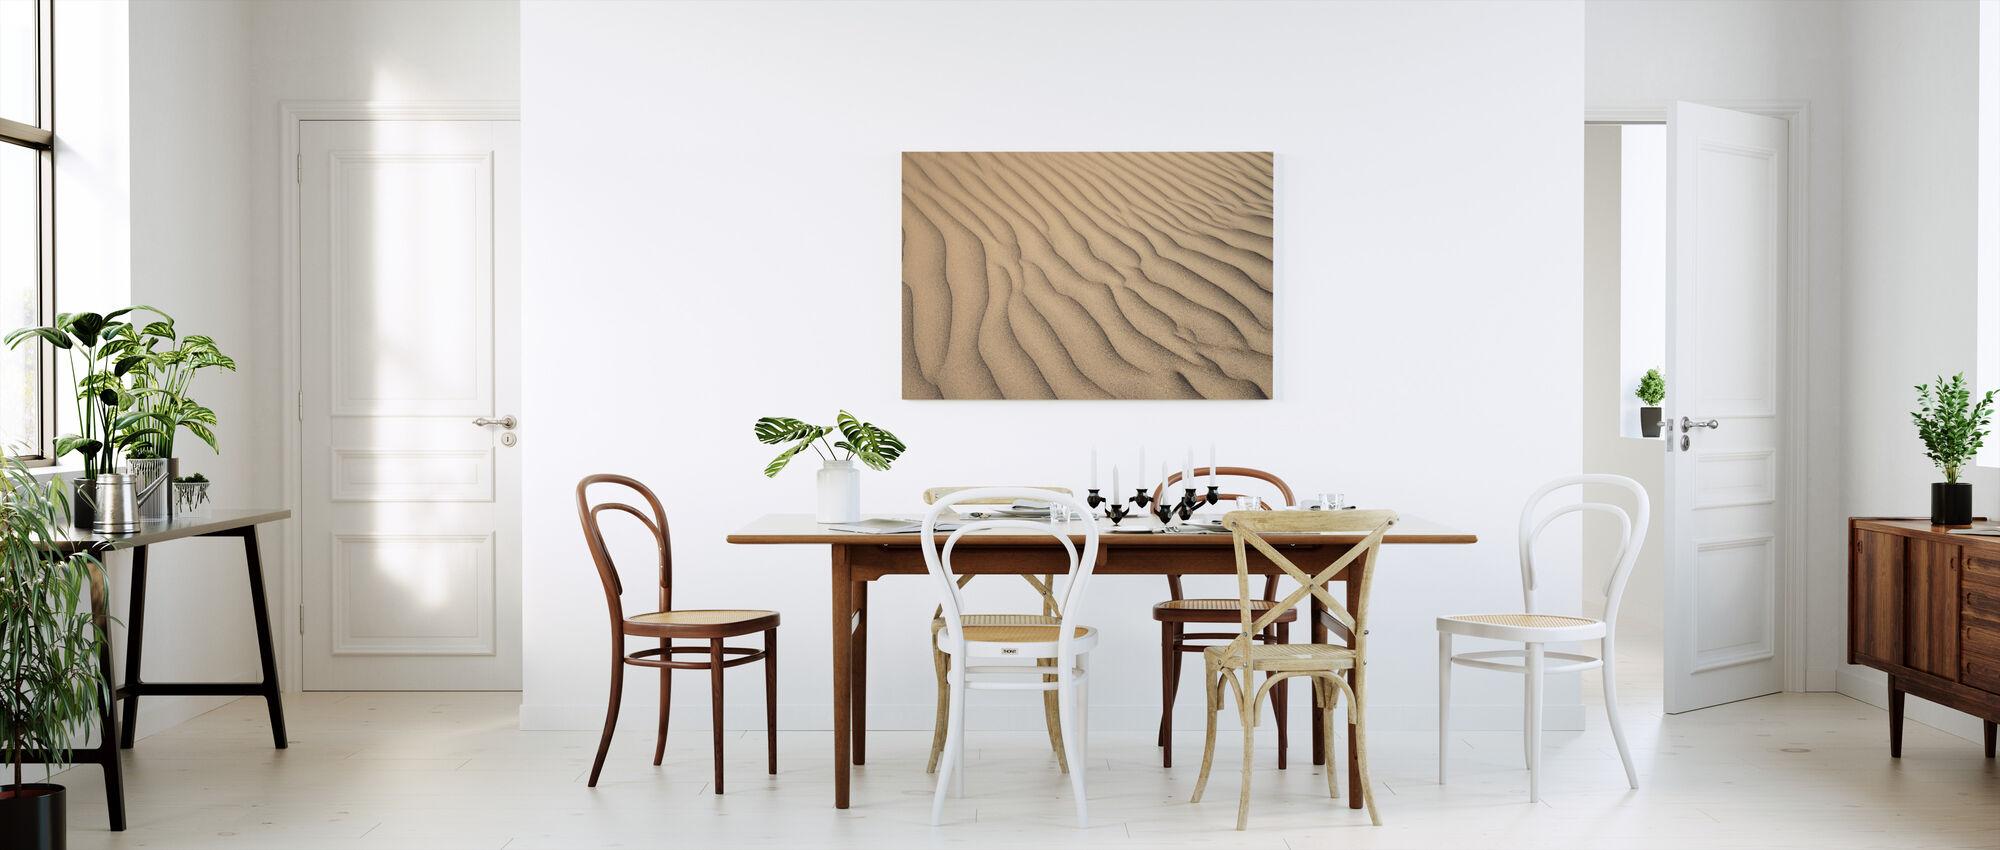 Desert Sand - Canvas print - Kitchen